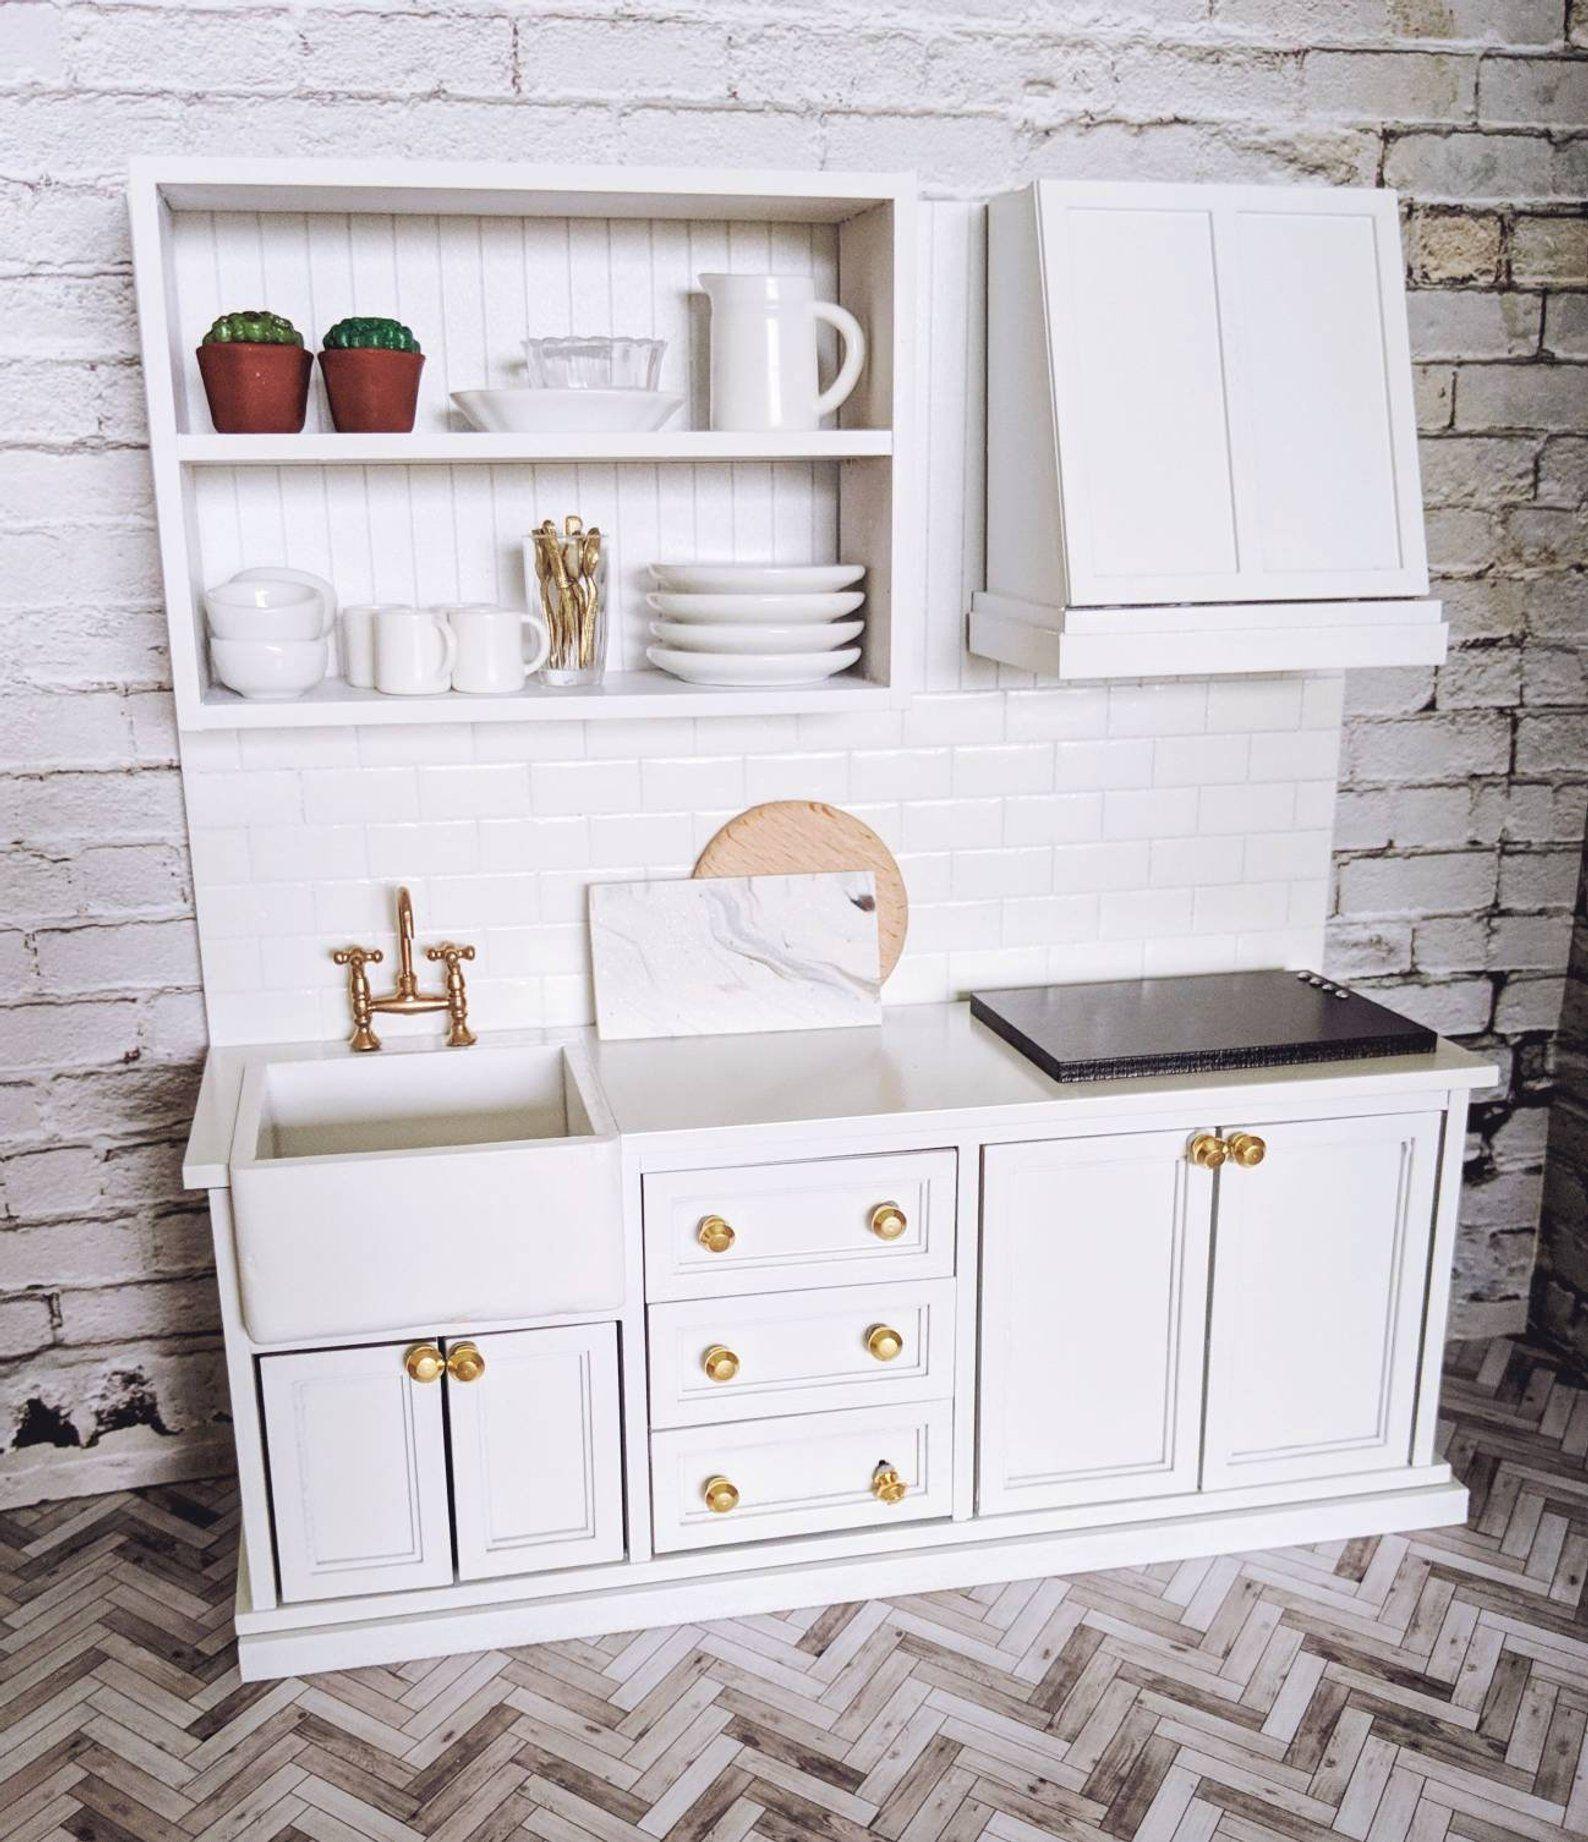 Miniature kitchen, modern kitchen for dollhouse, farmhouse kitchen, functional mini kitchen, mini modern dollhouse furniture #miniaturekitchen